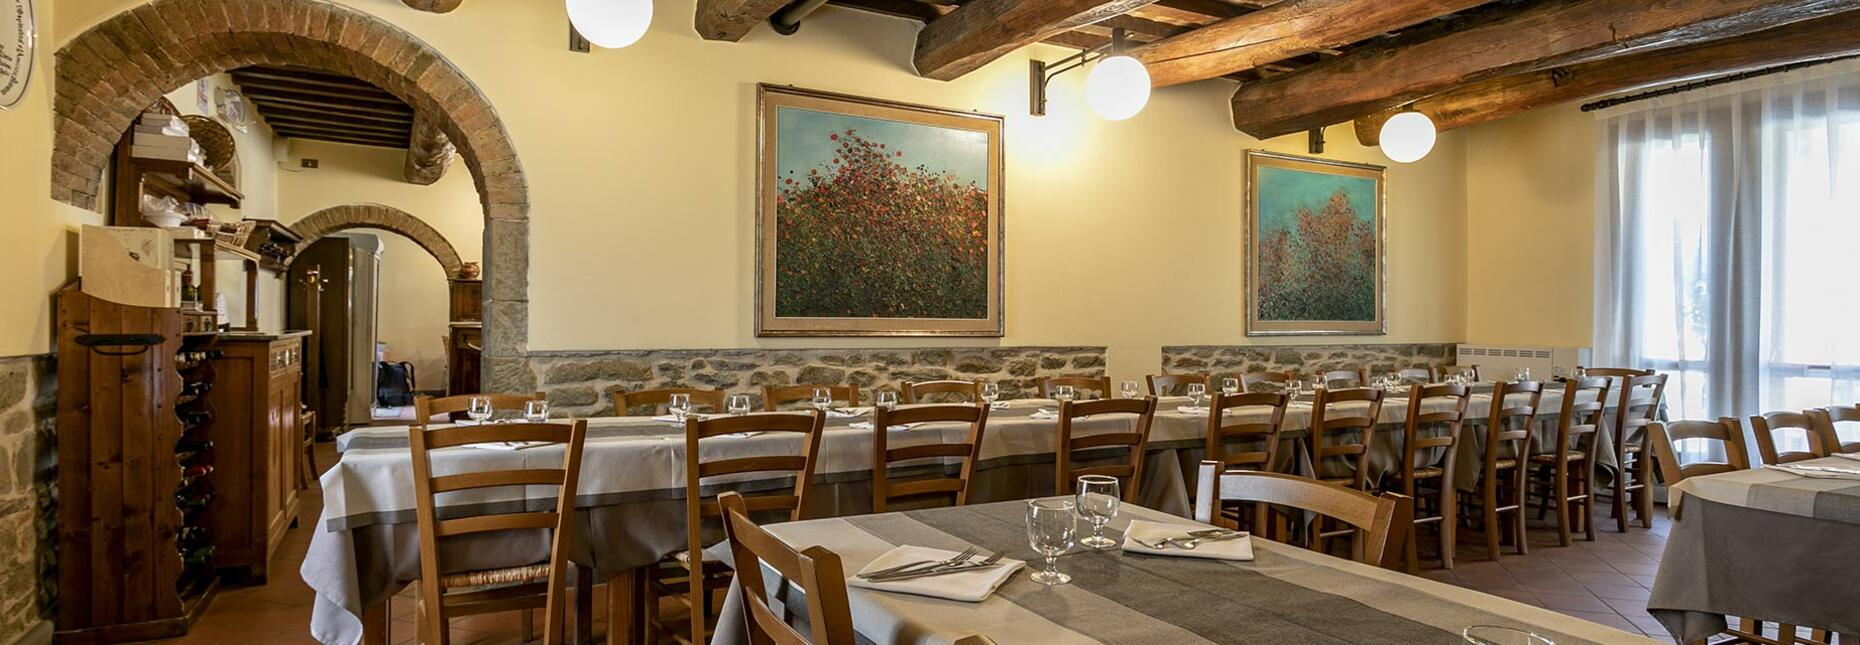 cadigianni en restaurant 007